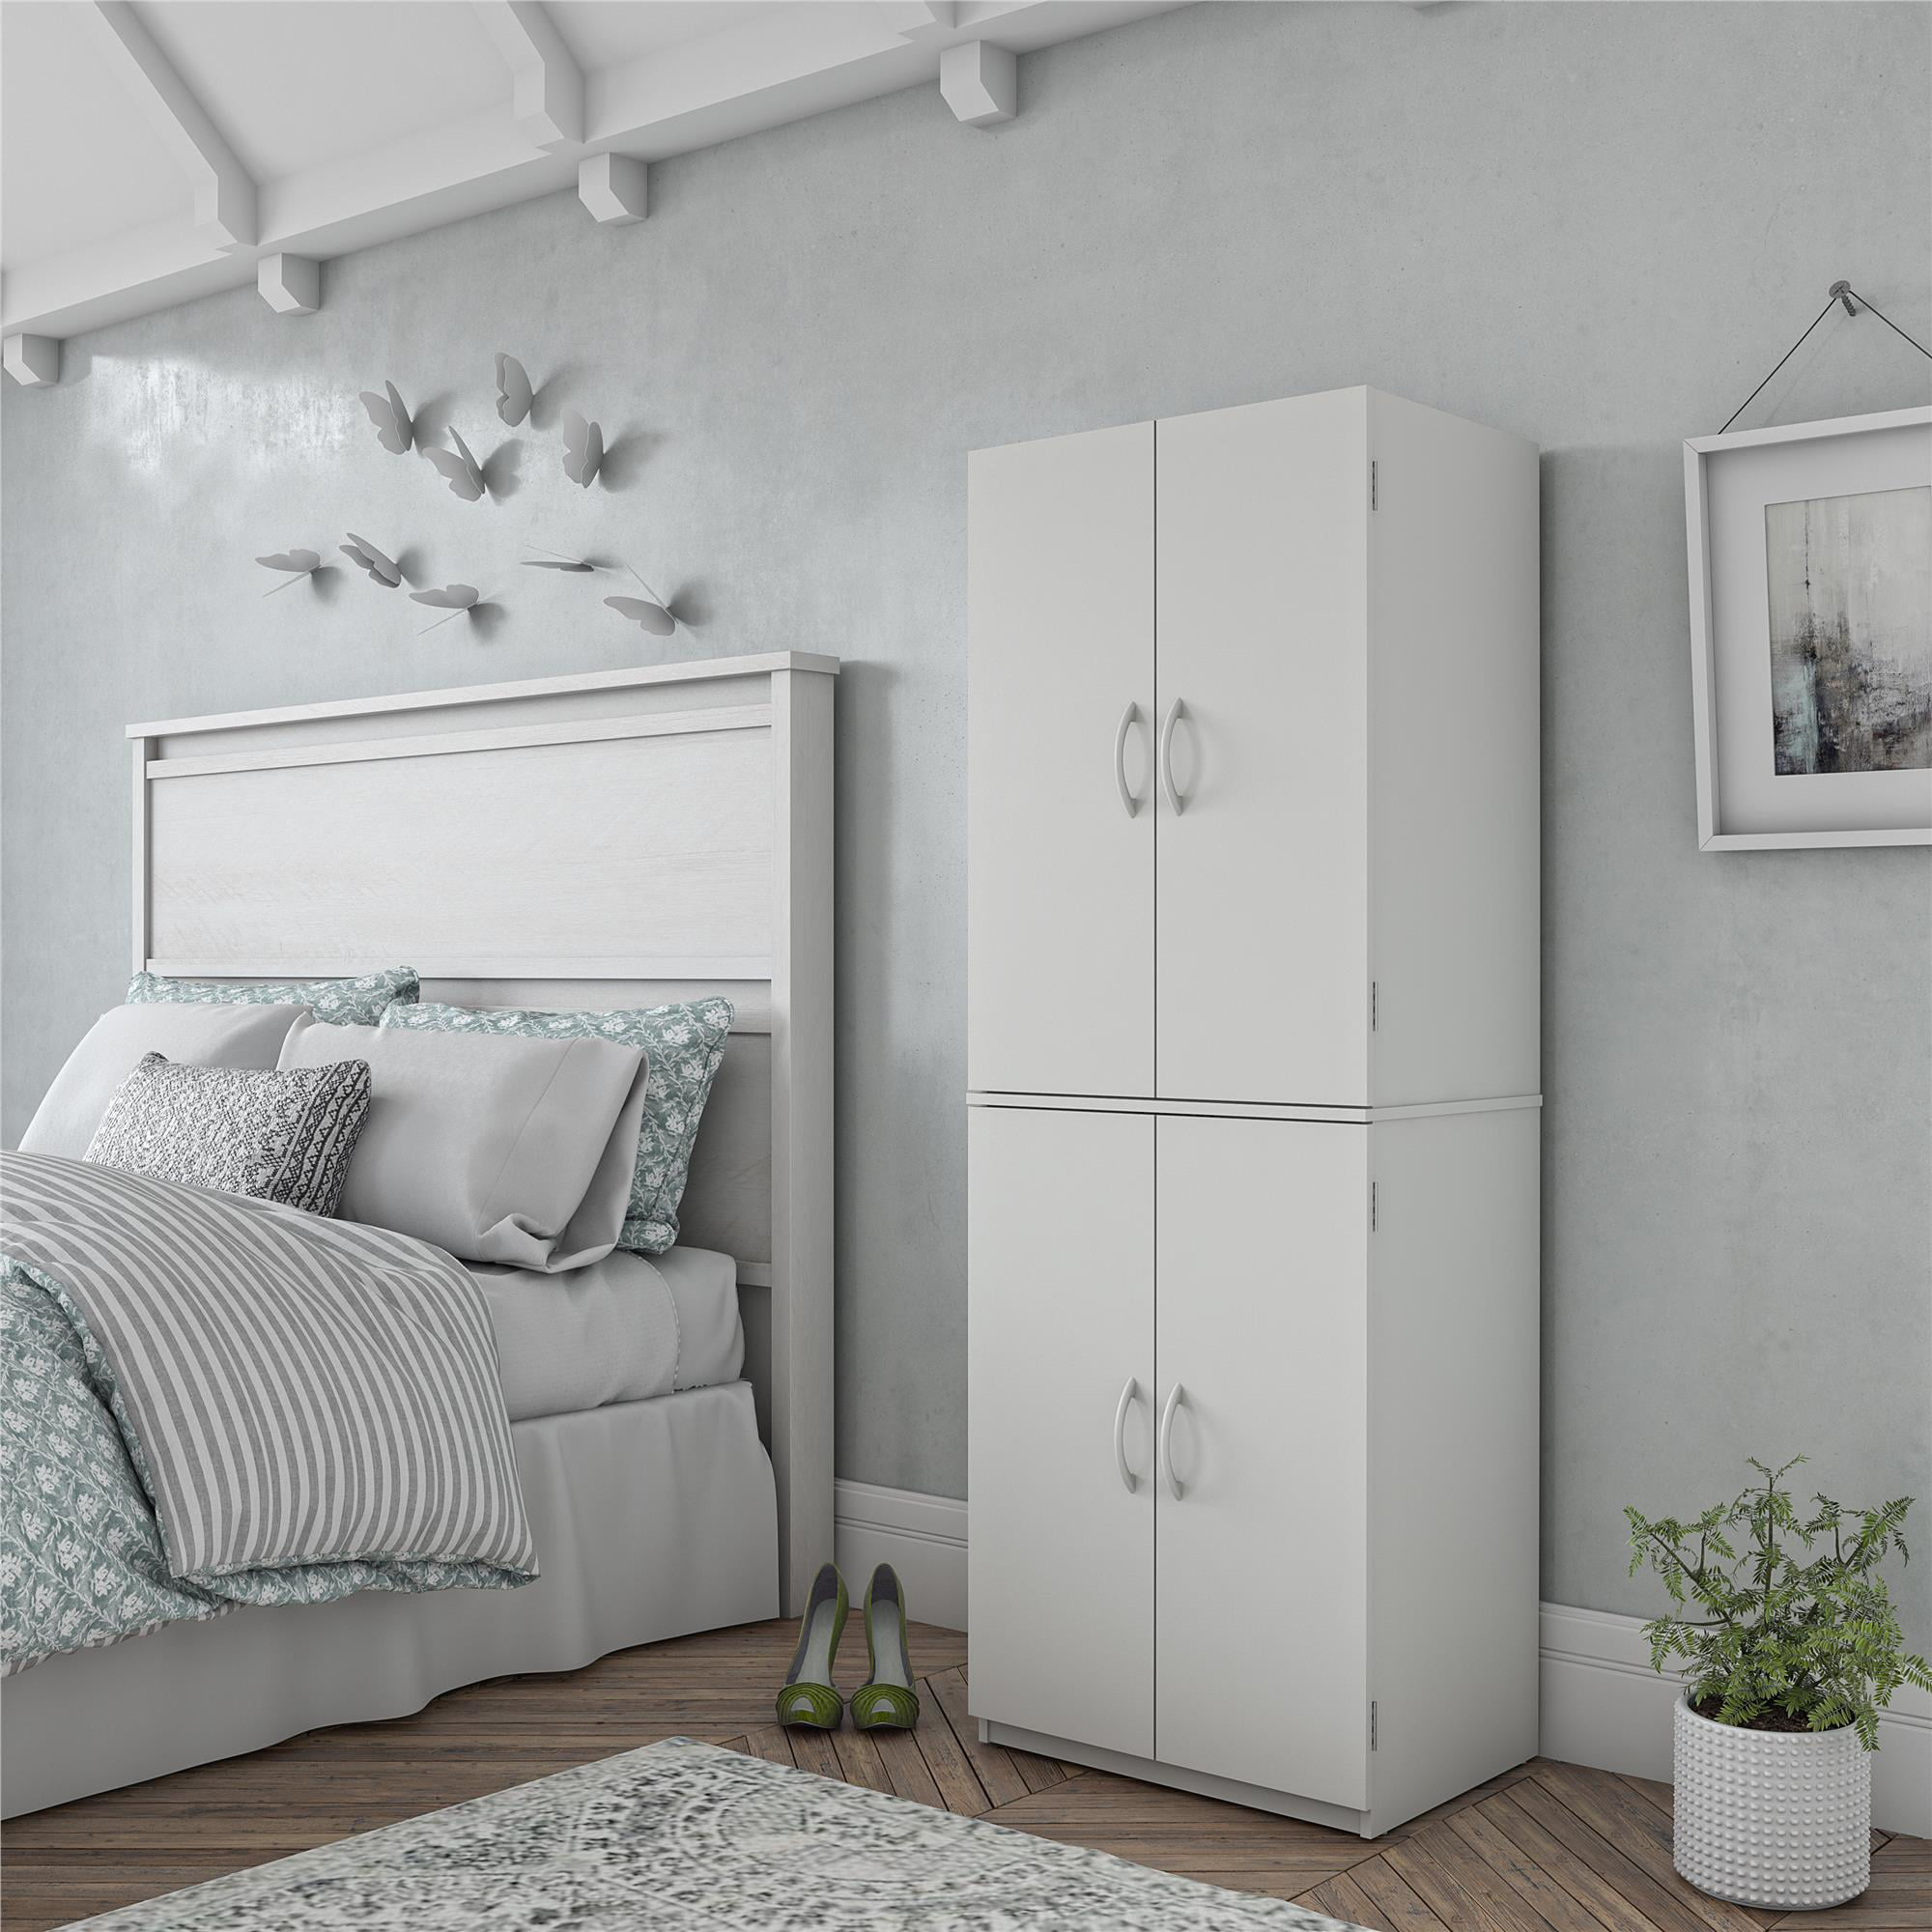 Picture of: Tall Storage Cabinet Kitchen Pantry Cupboard Organizer Furniture Black White Oak Ebay